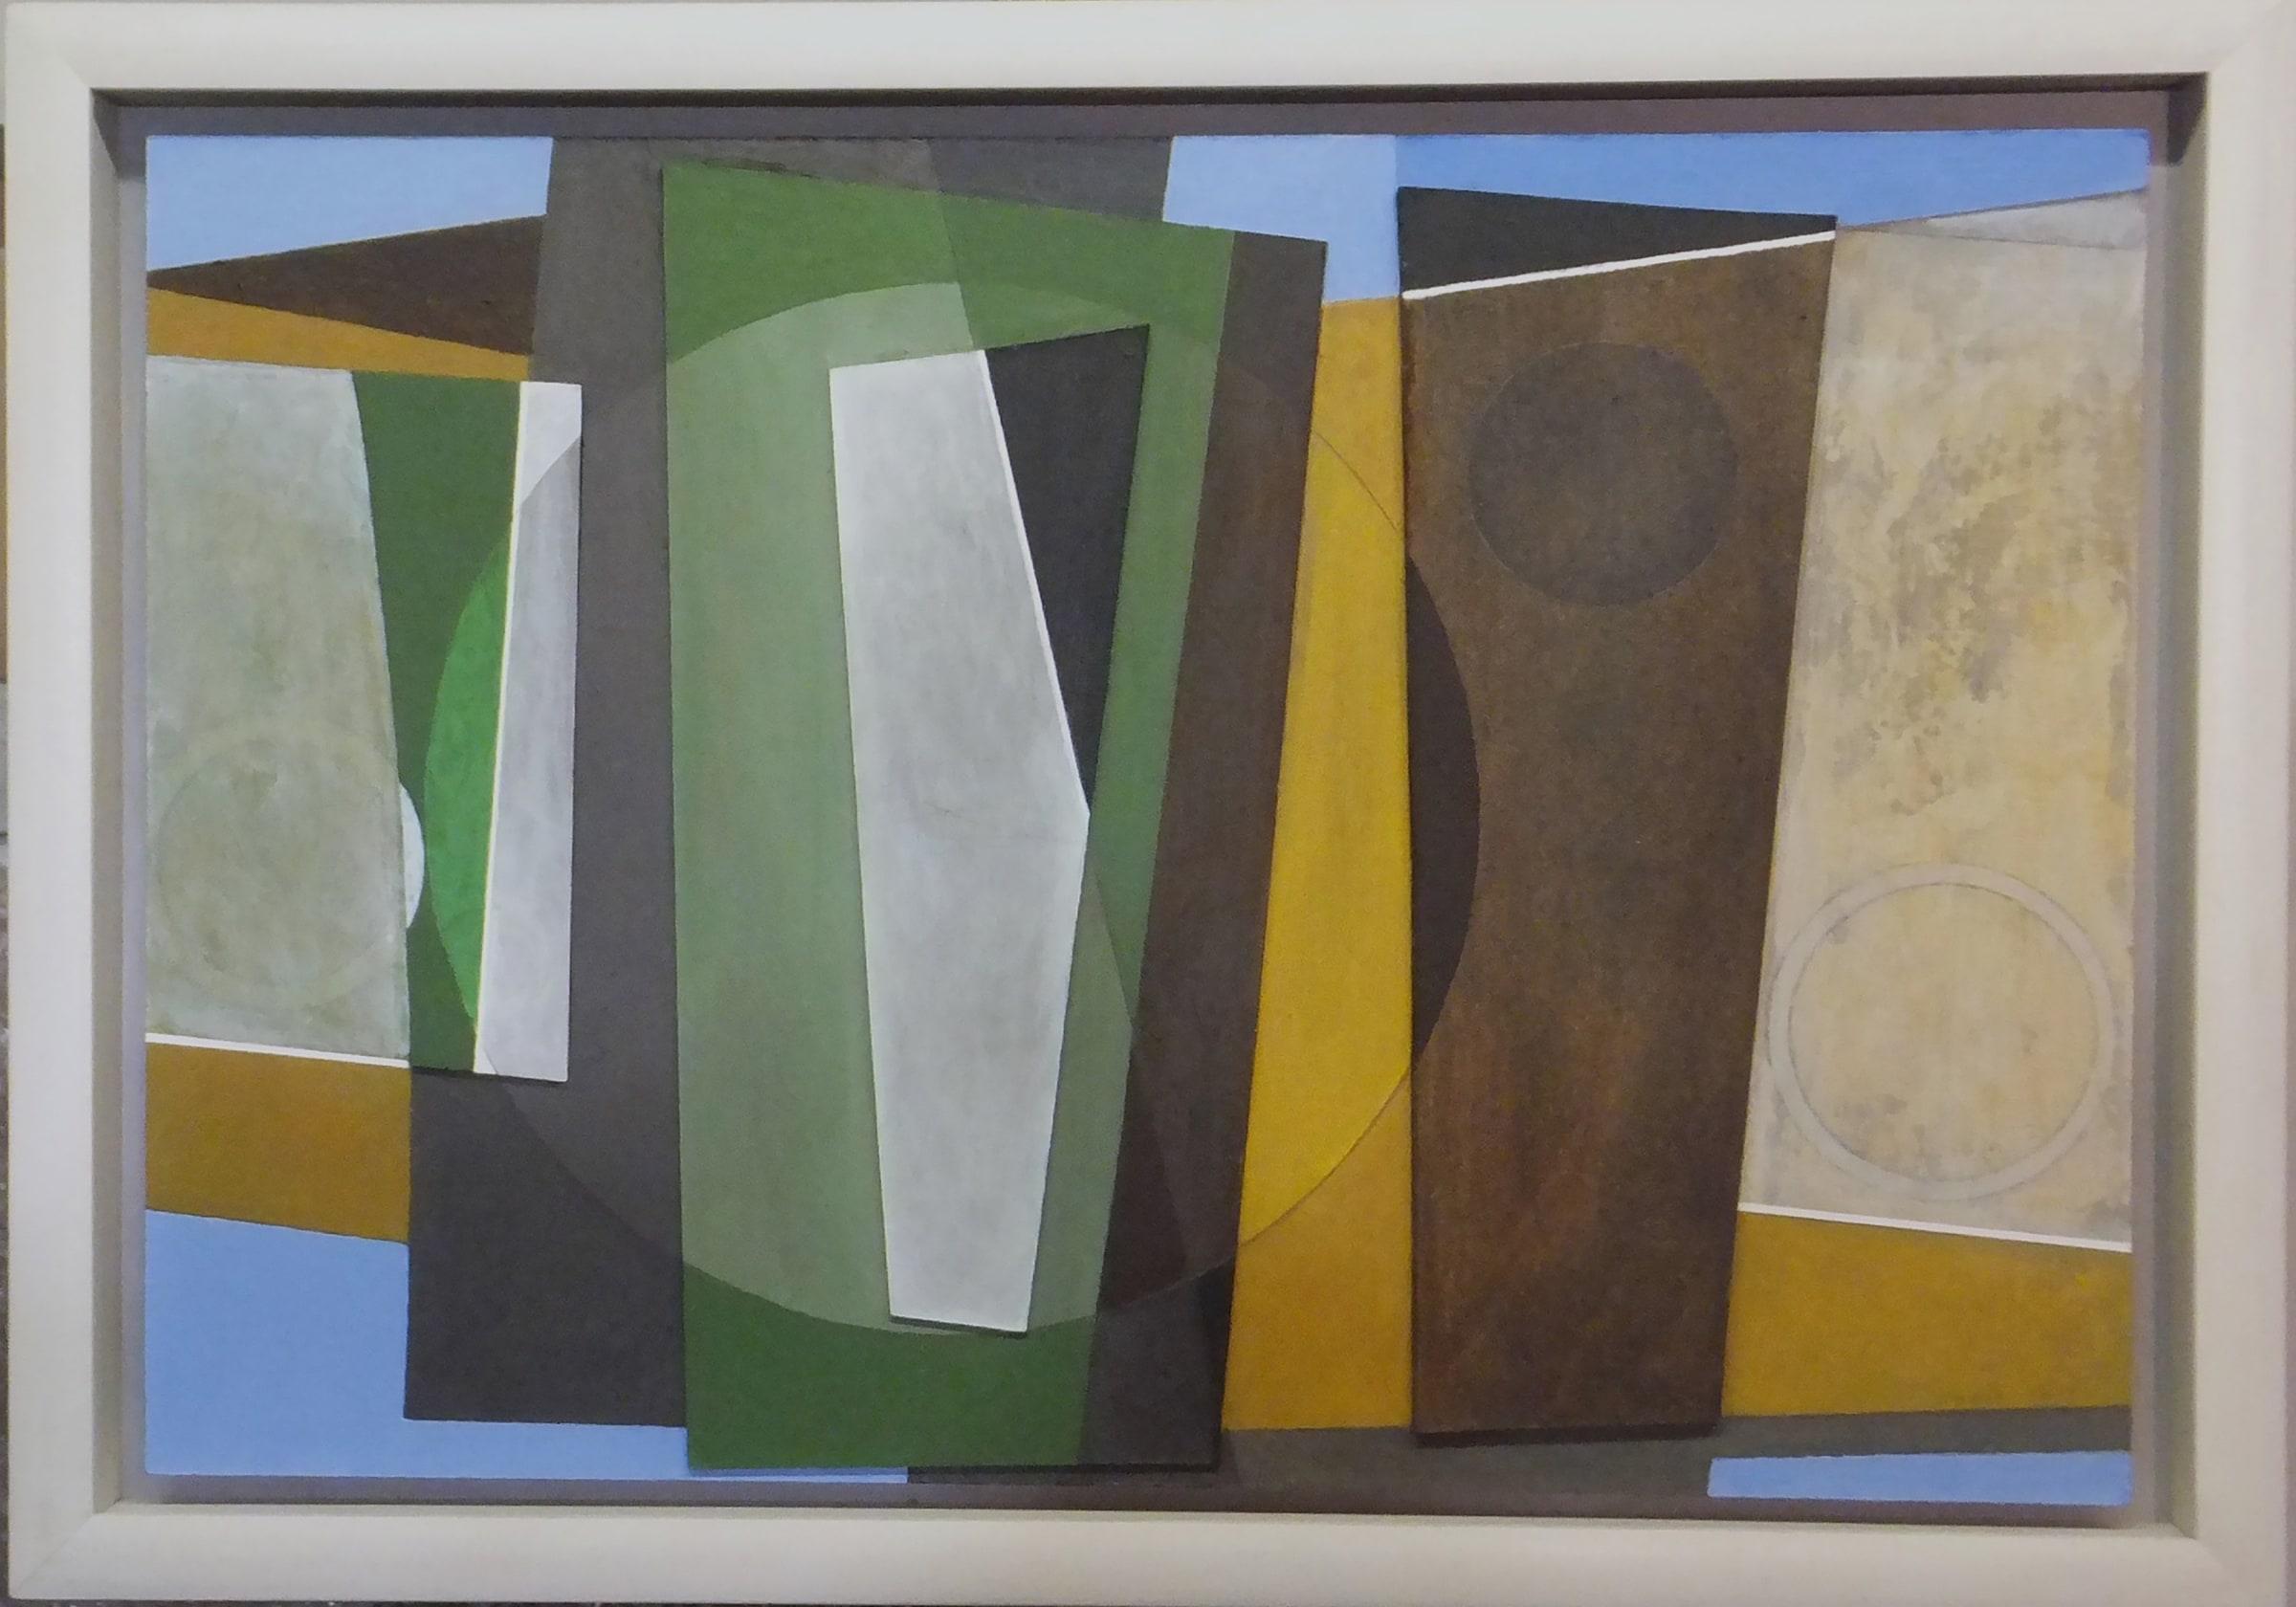 "<span class=""link fancybox-details-link""><a href=""/artists/172-patrick-haughton/works/6995-patrick-haughton-circles-and-stones-2020/"">View Detail Page</a></span><div class=""artist""><strong>Patrick Haughton</strong></div> b. 1942 <div class=""title""><em>Circles and Stones</em>, 2020</div> <div class=""medium"">Relief construction/acrylic painting</div> <div class=""dimensions"">h. 40 cm x w. 59 cm</div><div class=""price"">£1,500.00</div><div class=""copyright_line"">Copyright The Artist</div>"